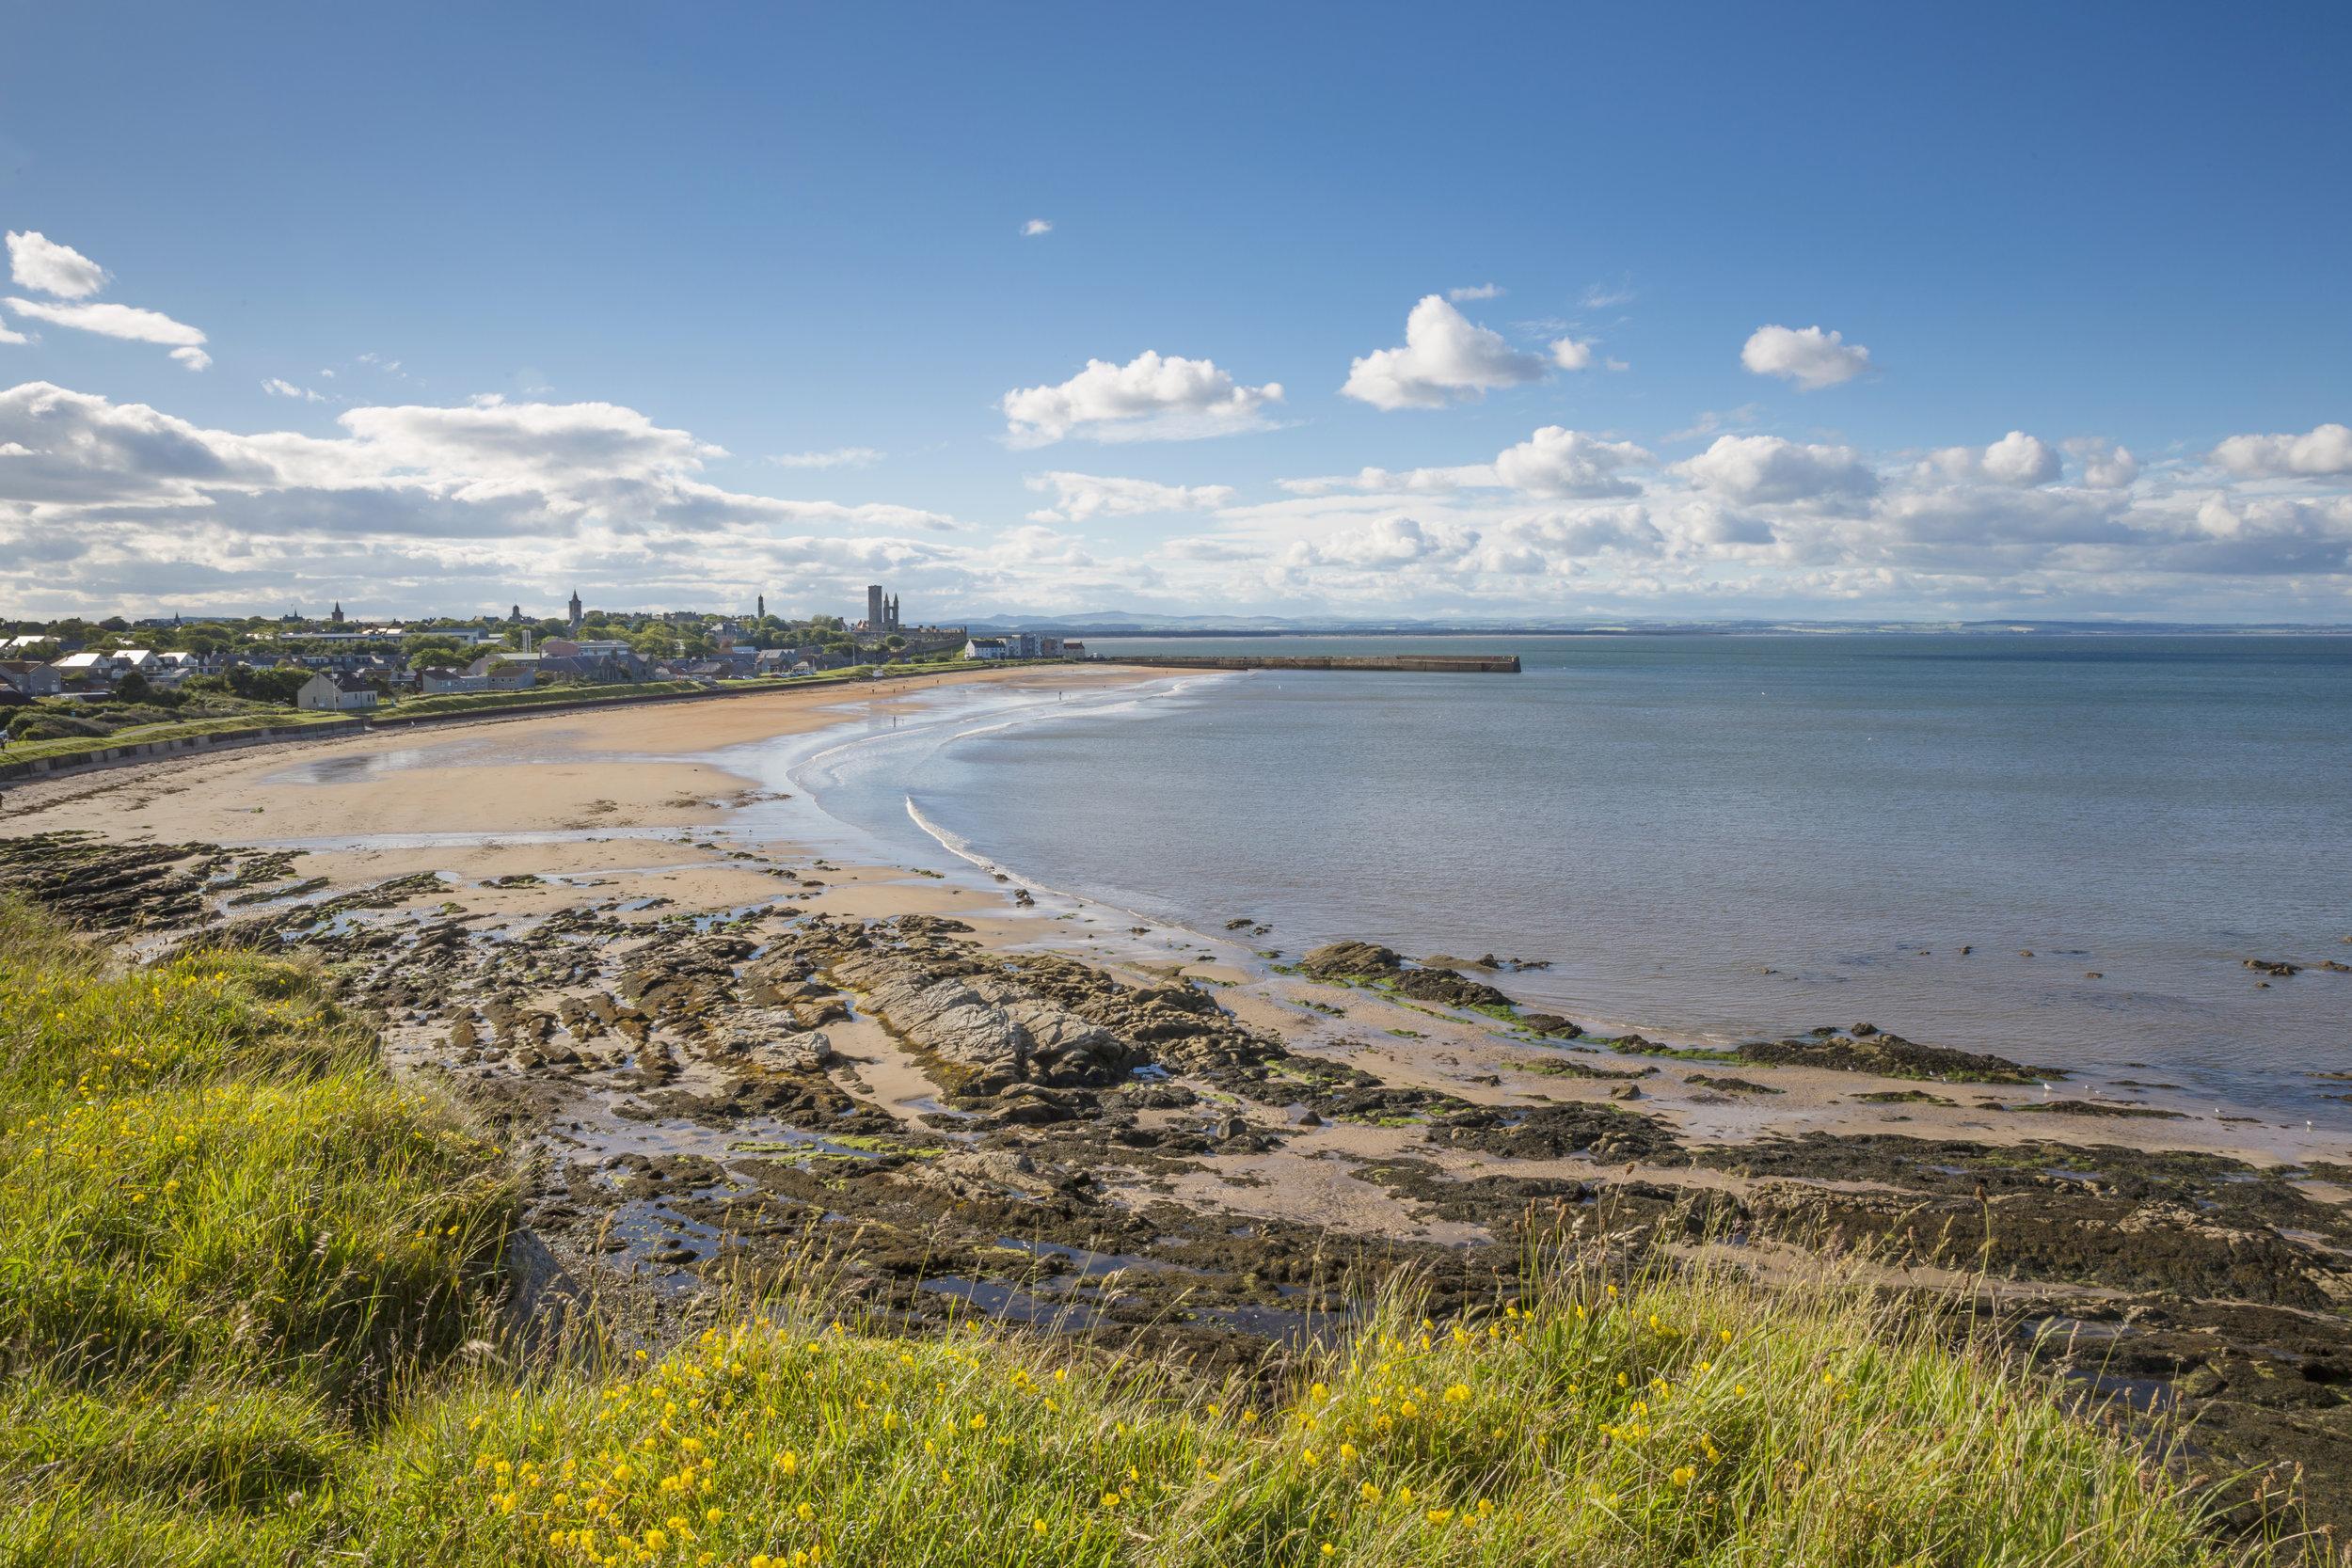 St Andrews visitscotland_36646828408.jpg